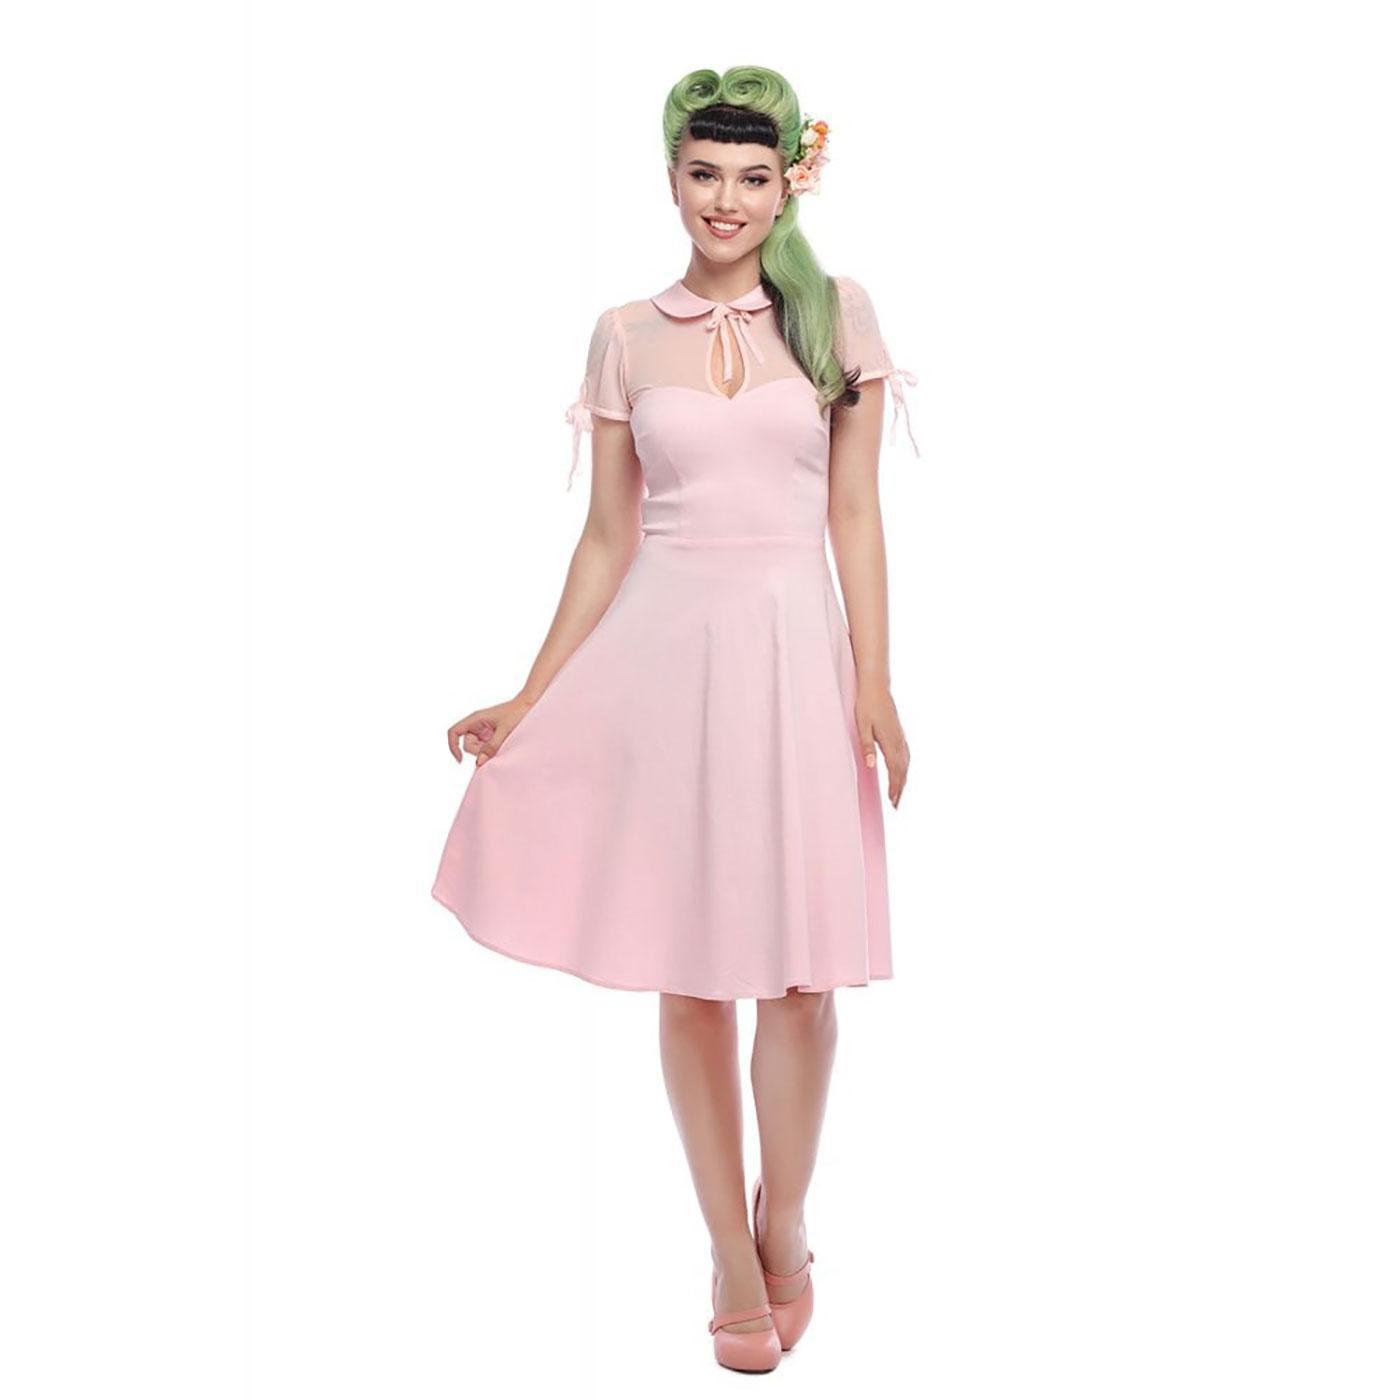 Kitten COLLECTIF Vintage Summer Swing Dress PINK